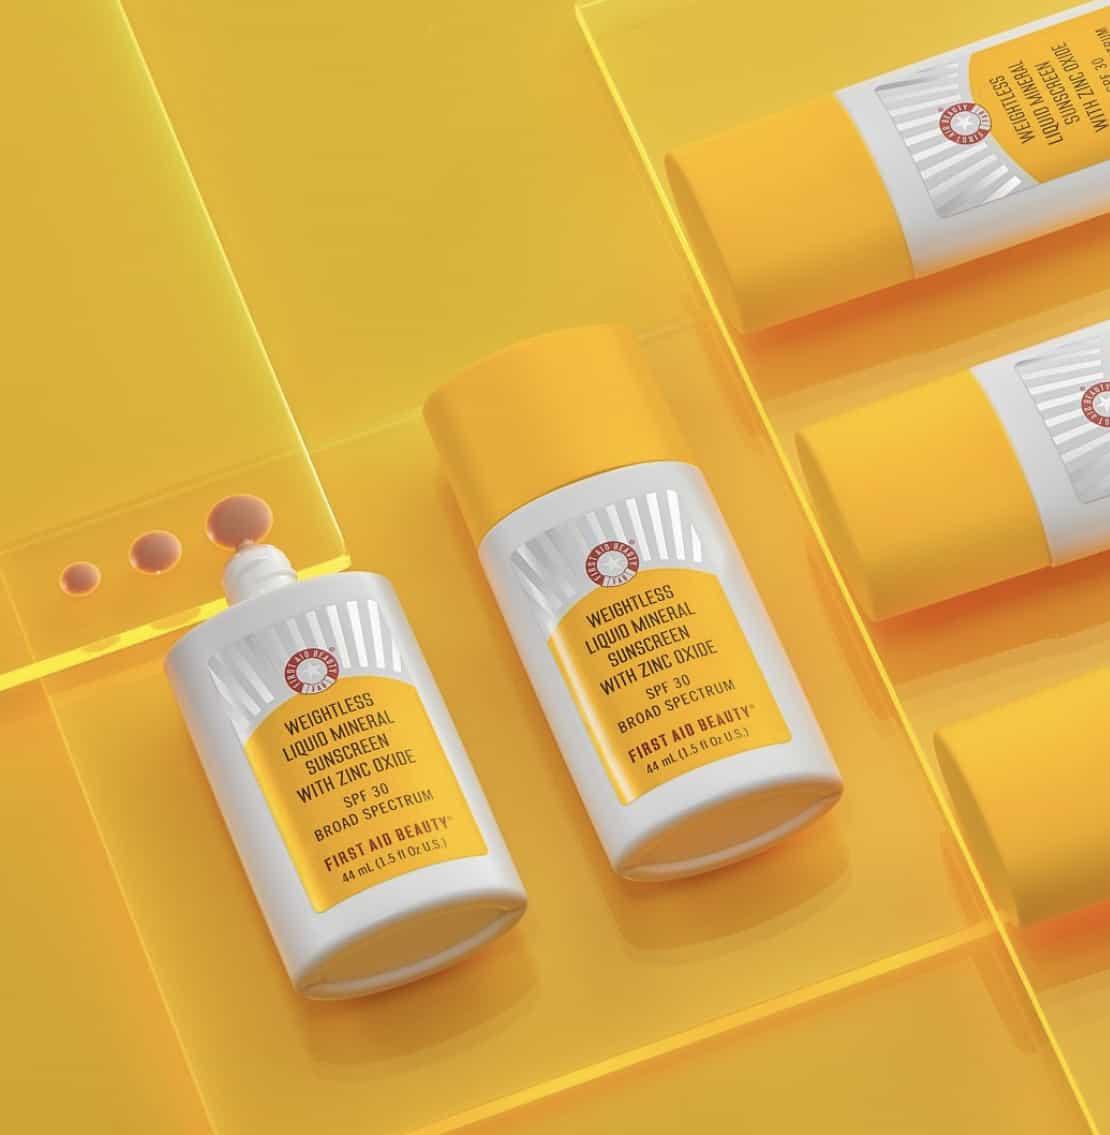 First Aid Beauty Weightless Liquid Mineral Sunscreen